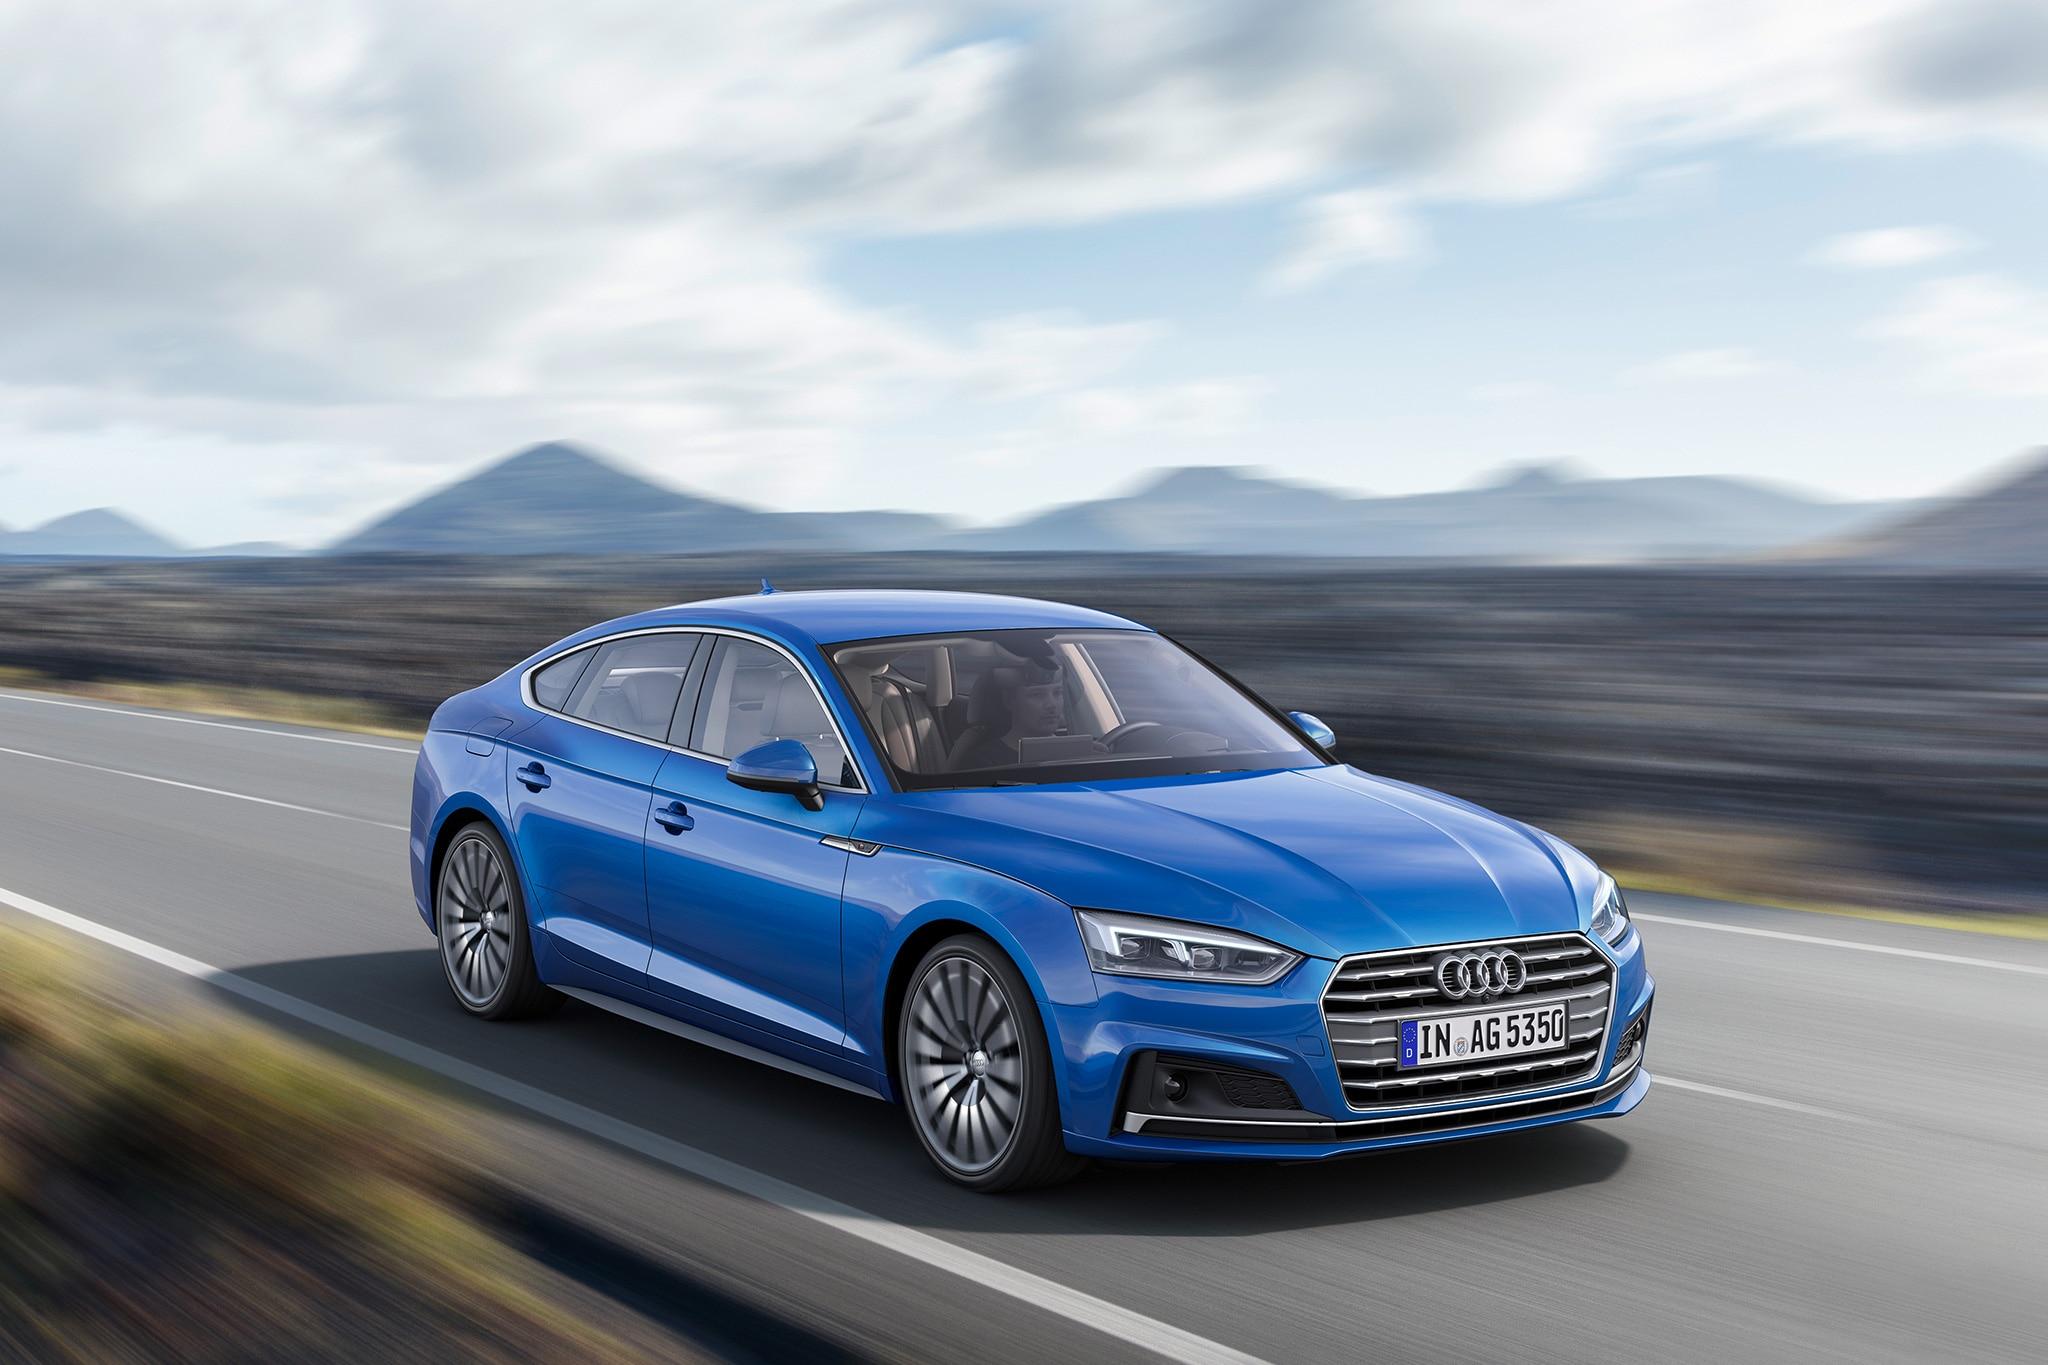 2018 Audi A5 Sportback European Spec Front Three Quarter In Motion 01 1